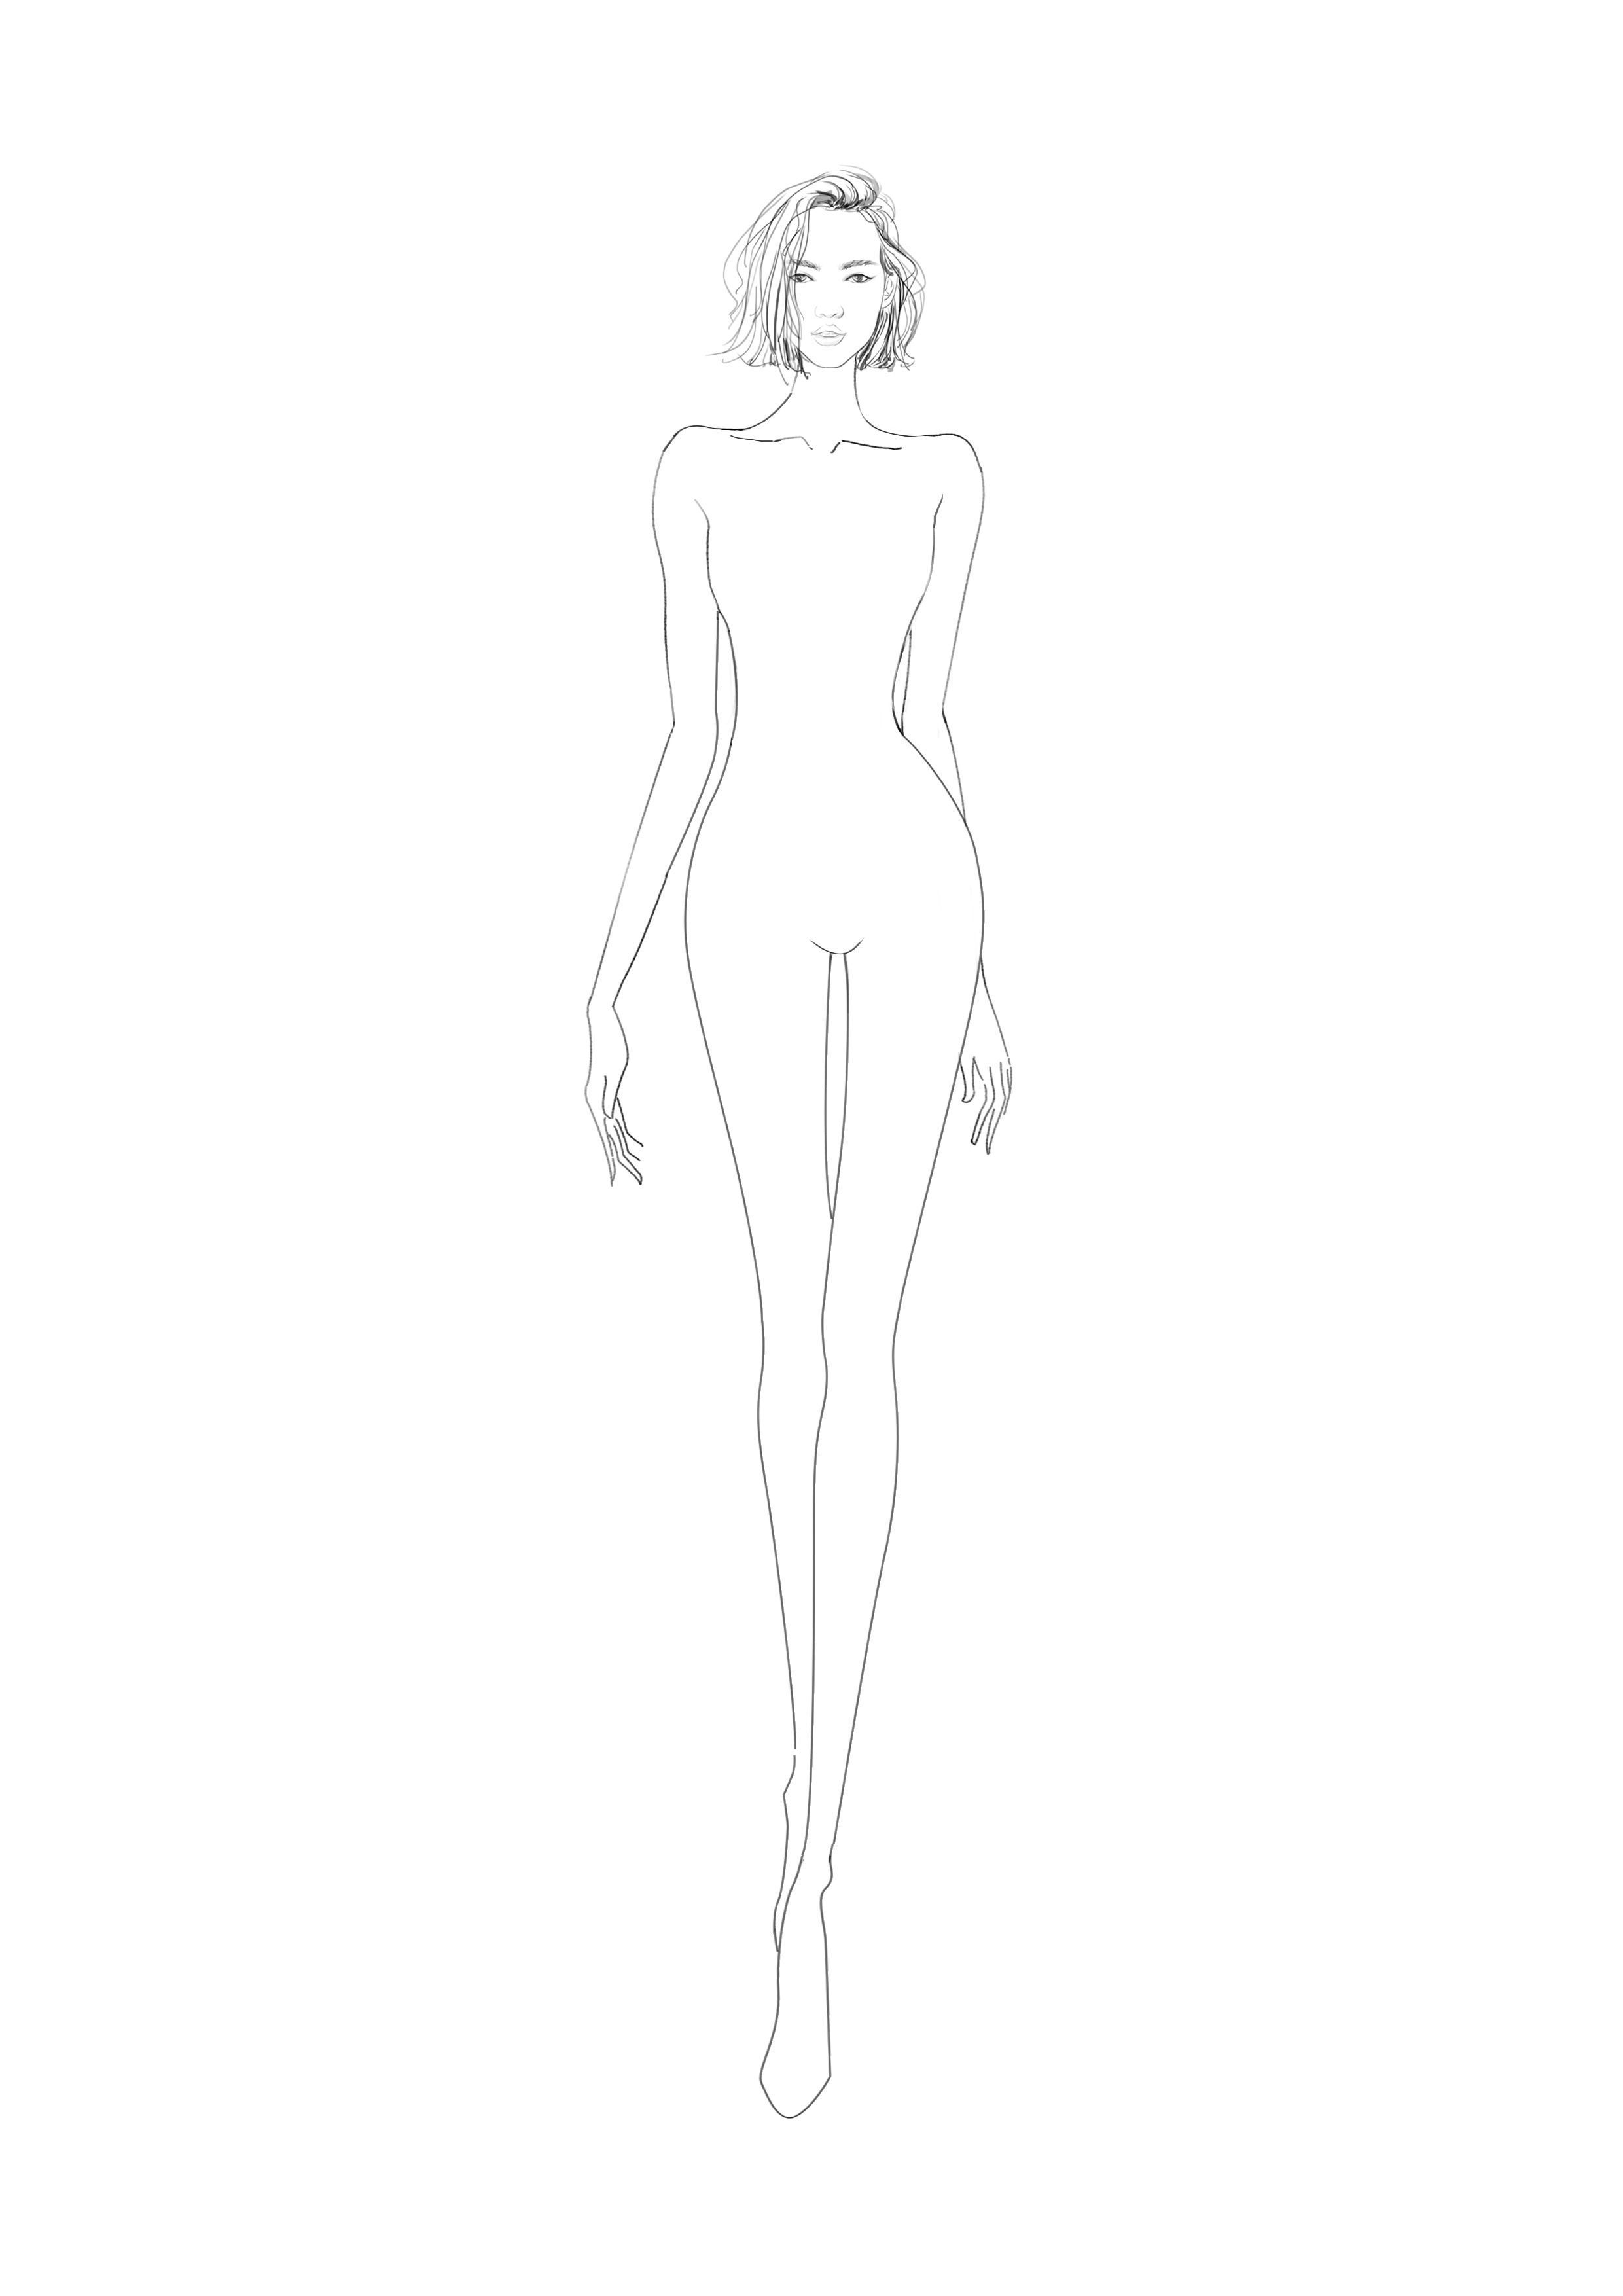 Drawings Disney In 2020 Fashion Figure Drawing Fashion Model Sketch Fashion Design Template